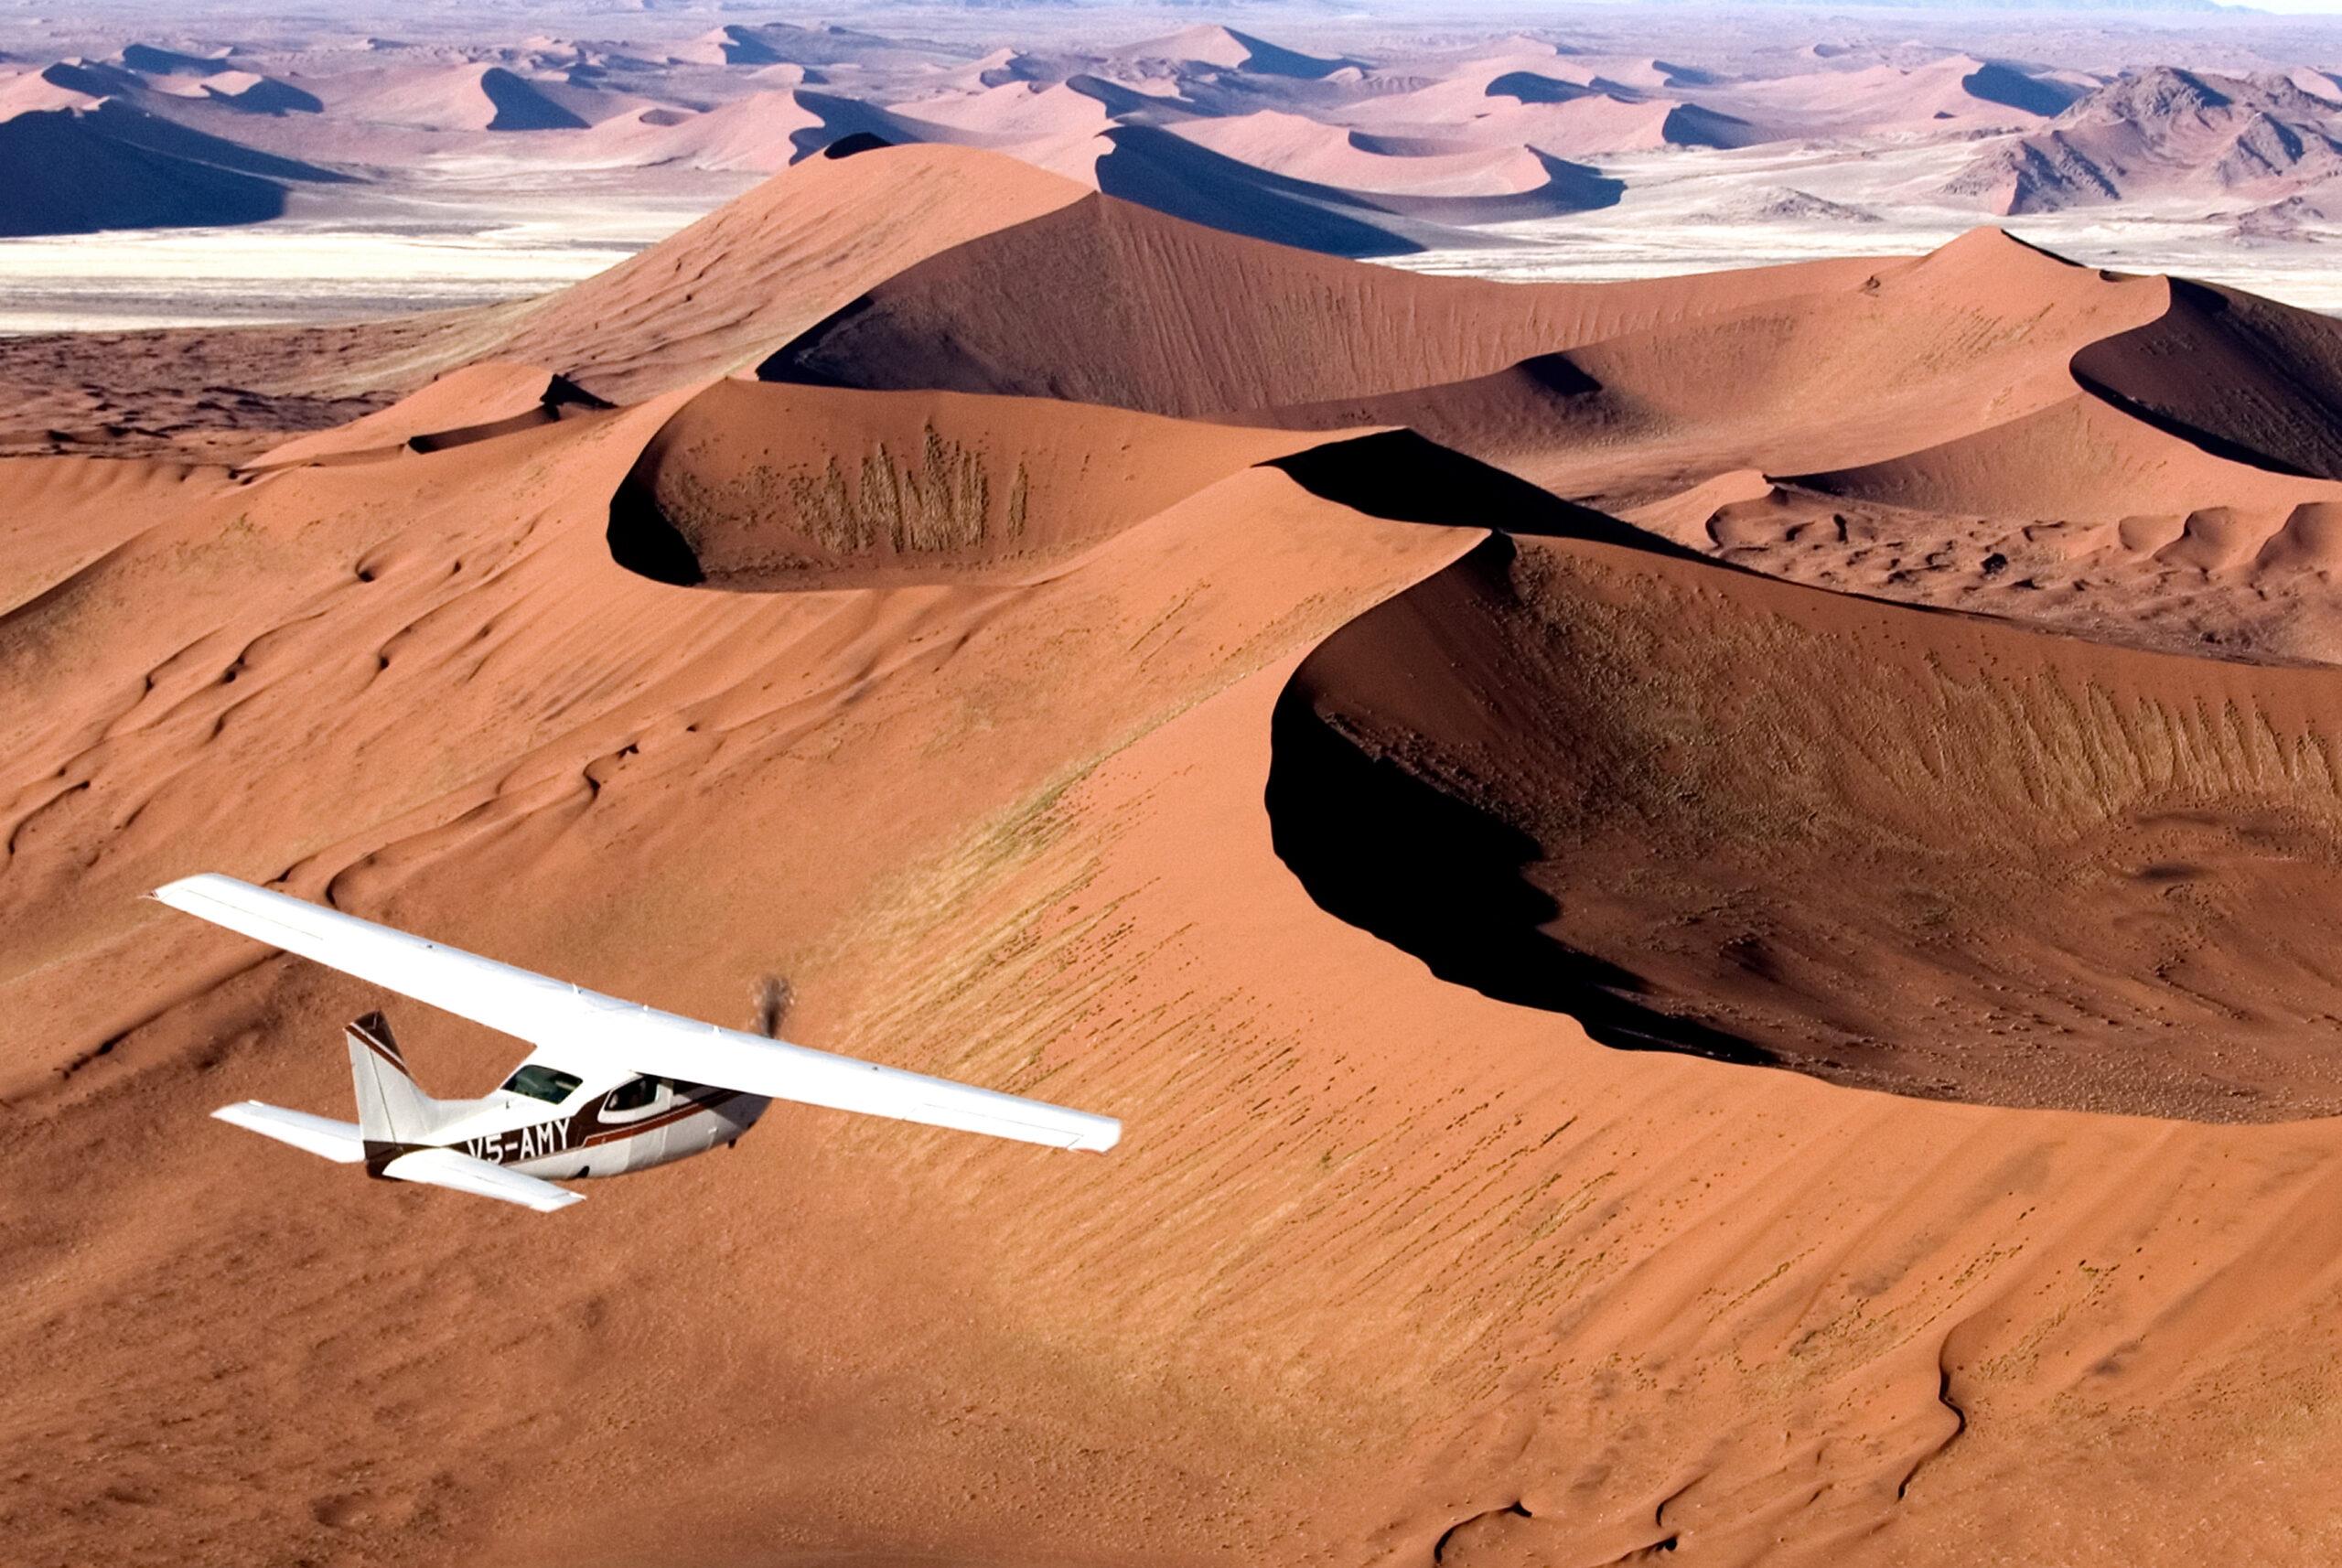 Schoemans Flying Safari